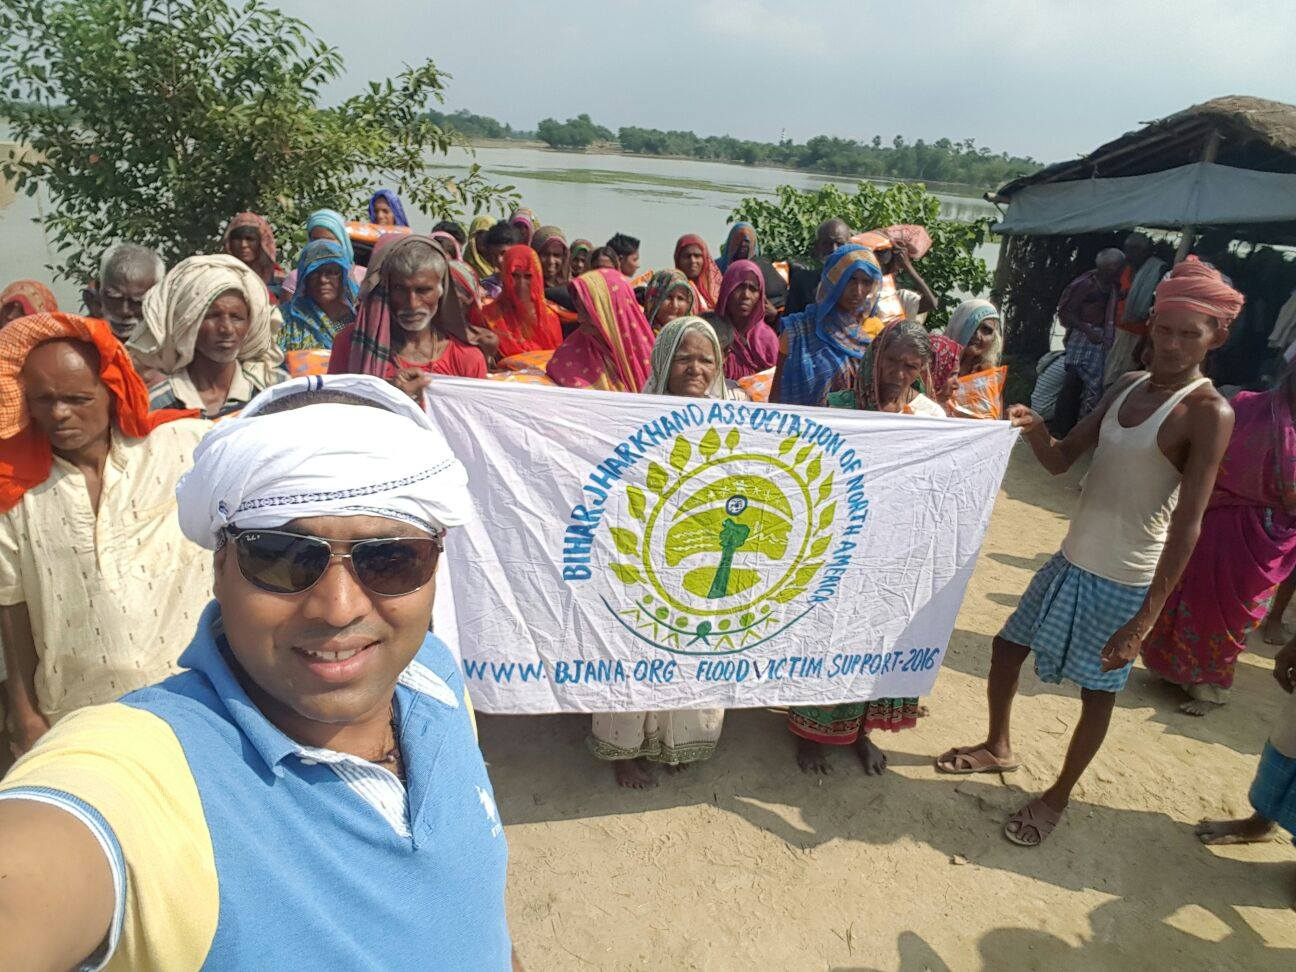 BJANA Member Mr. Alok Kumar organized a flood relief camp in Darbhanga, Bihar